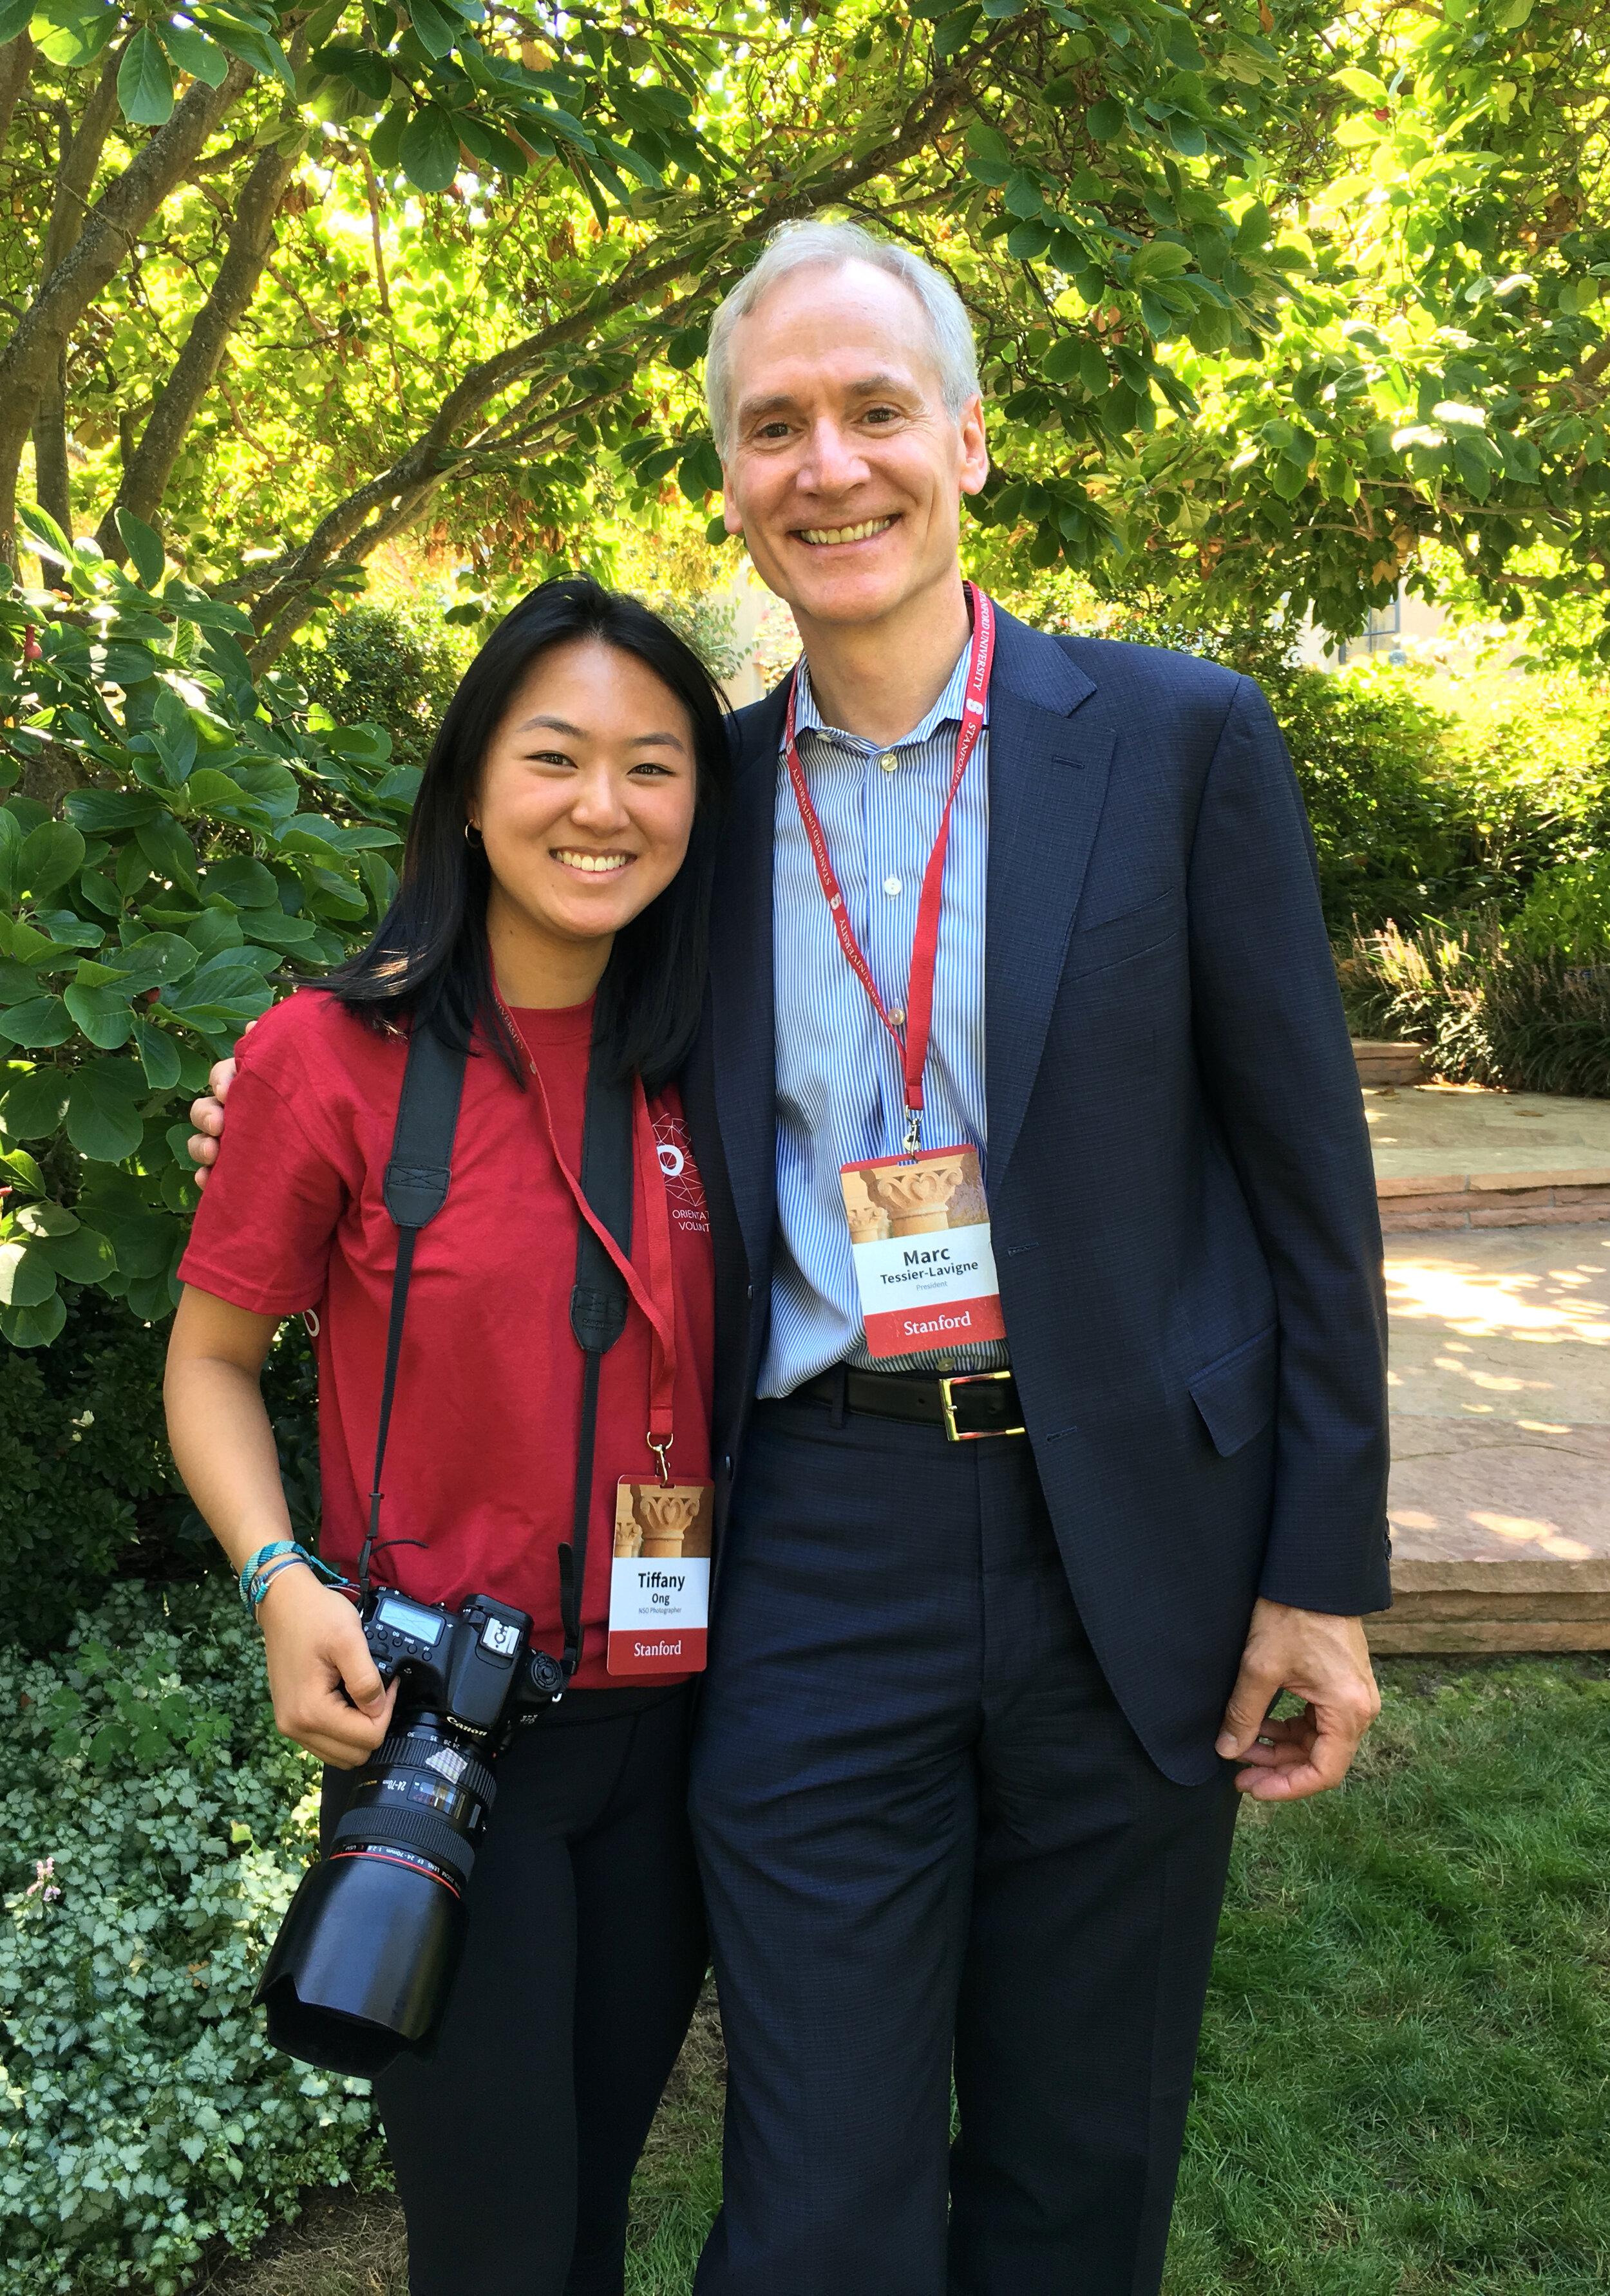 Posing with Marc Tessier-Lavigne, Stanford's president